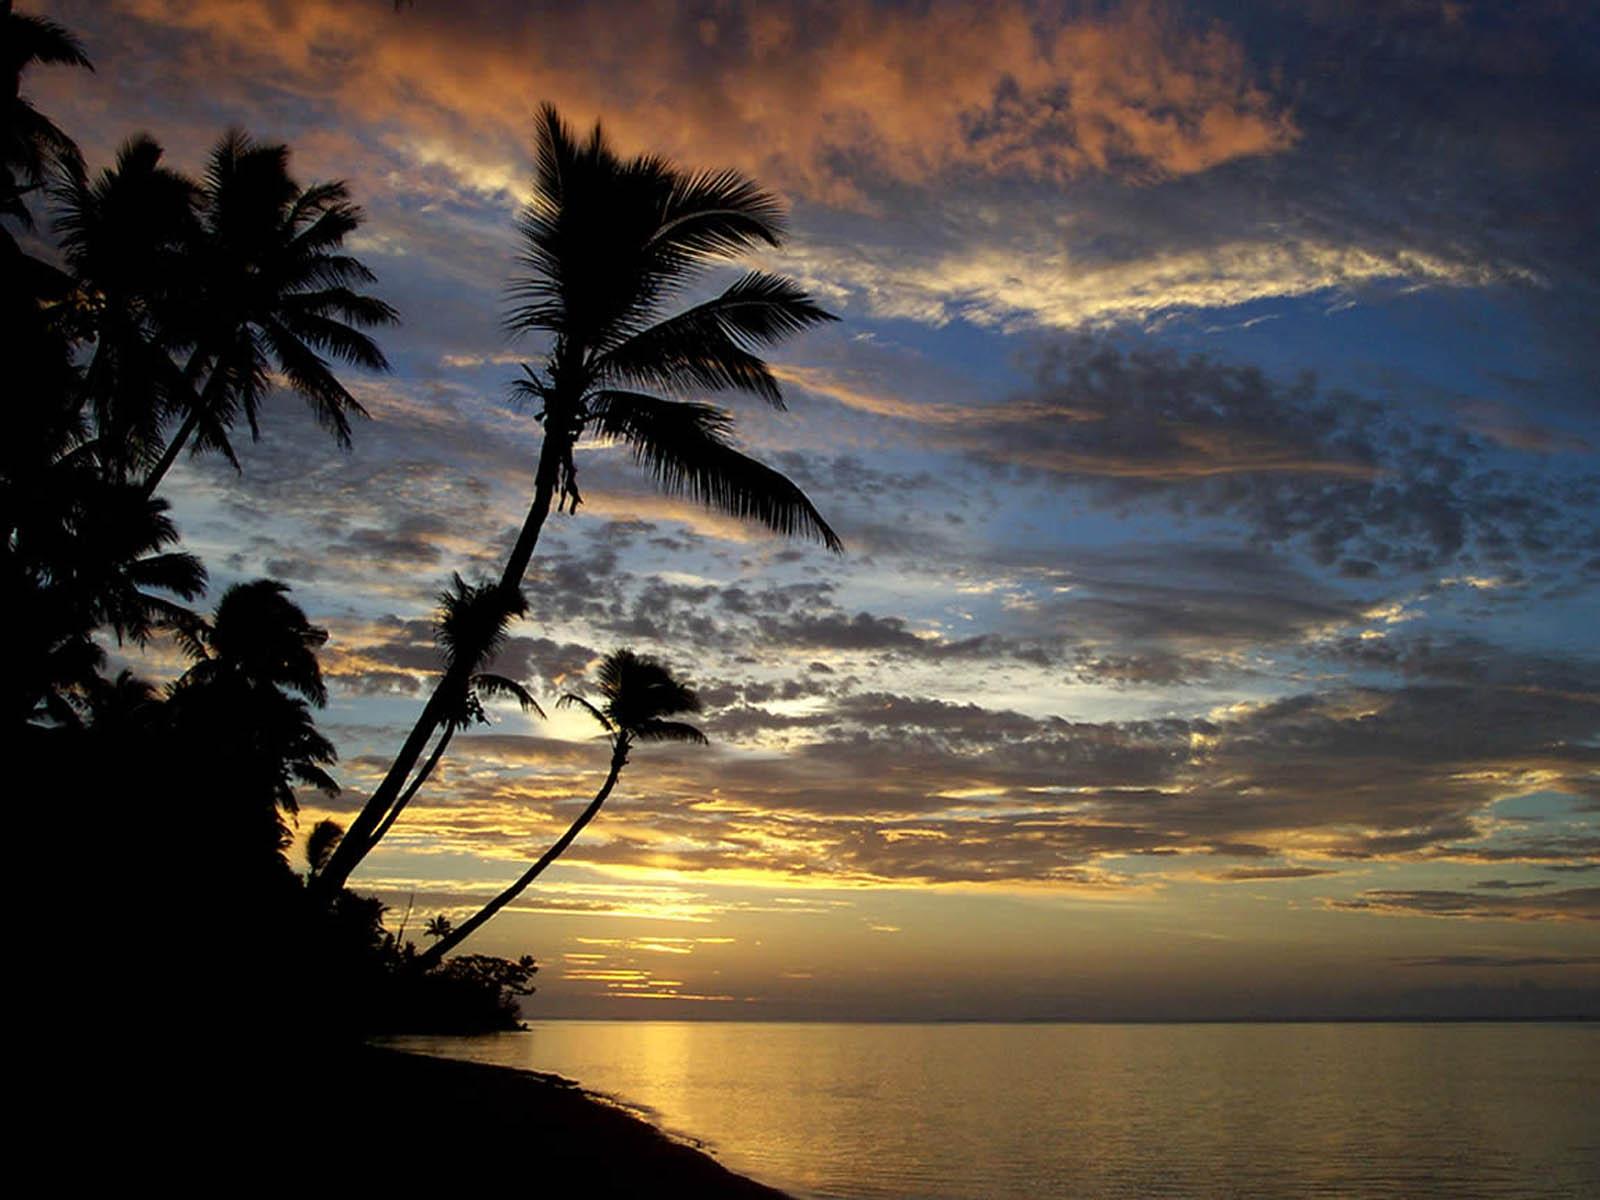 Hd Tropical Island Beach Paradise Wallpapers And Backgrounds: Wallpapers: Island Sunset Wallpapers